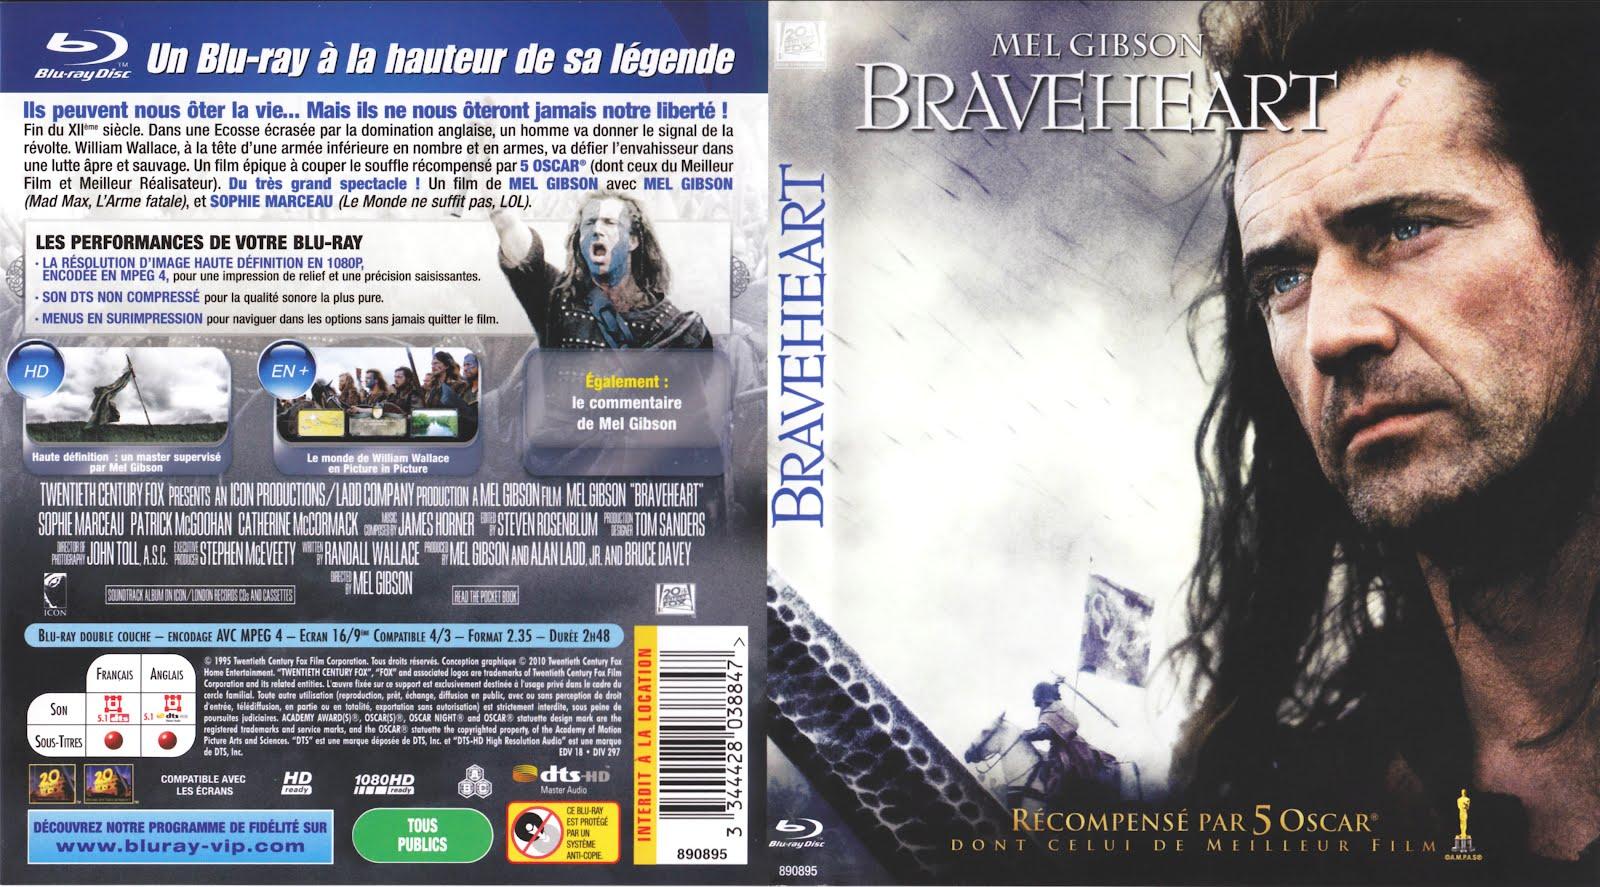 Braveheart Blu-ray Dvd disk Cover